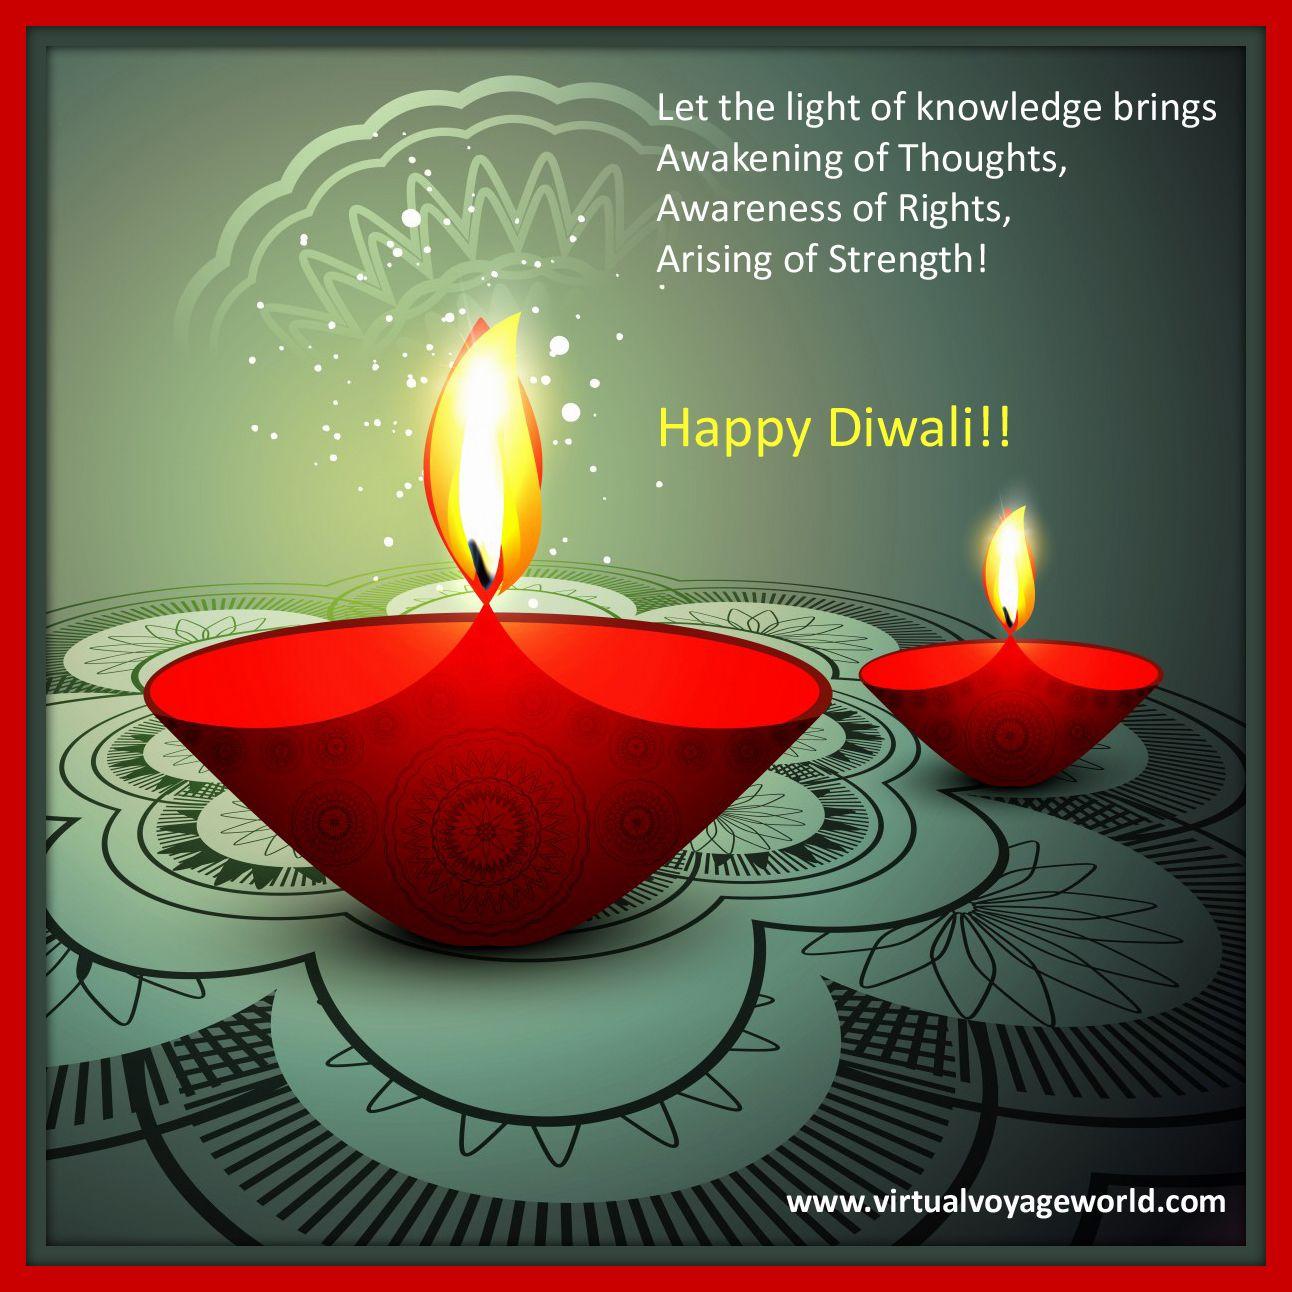 Follow your Heart to enlighten the Life! HappyDiwali